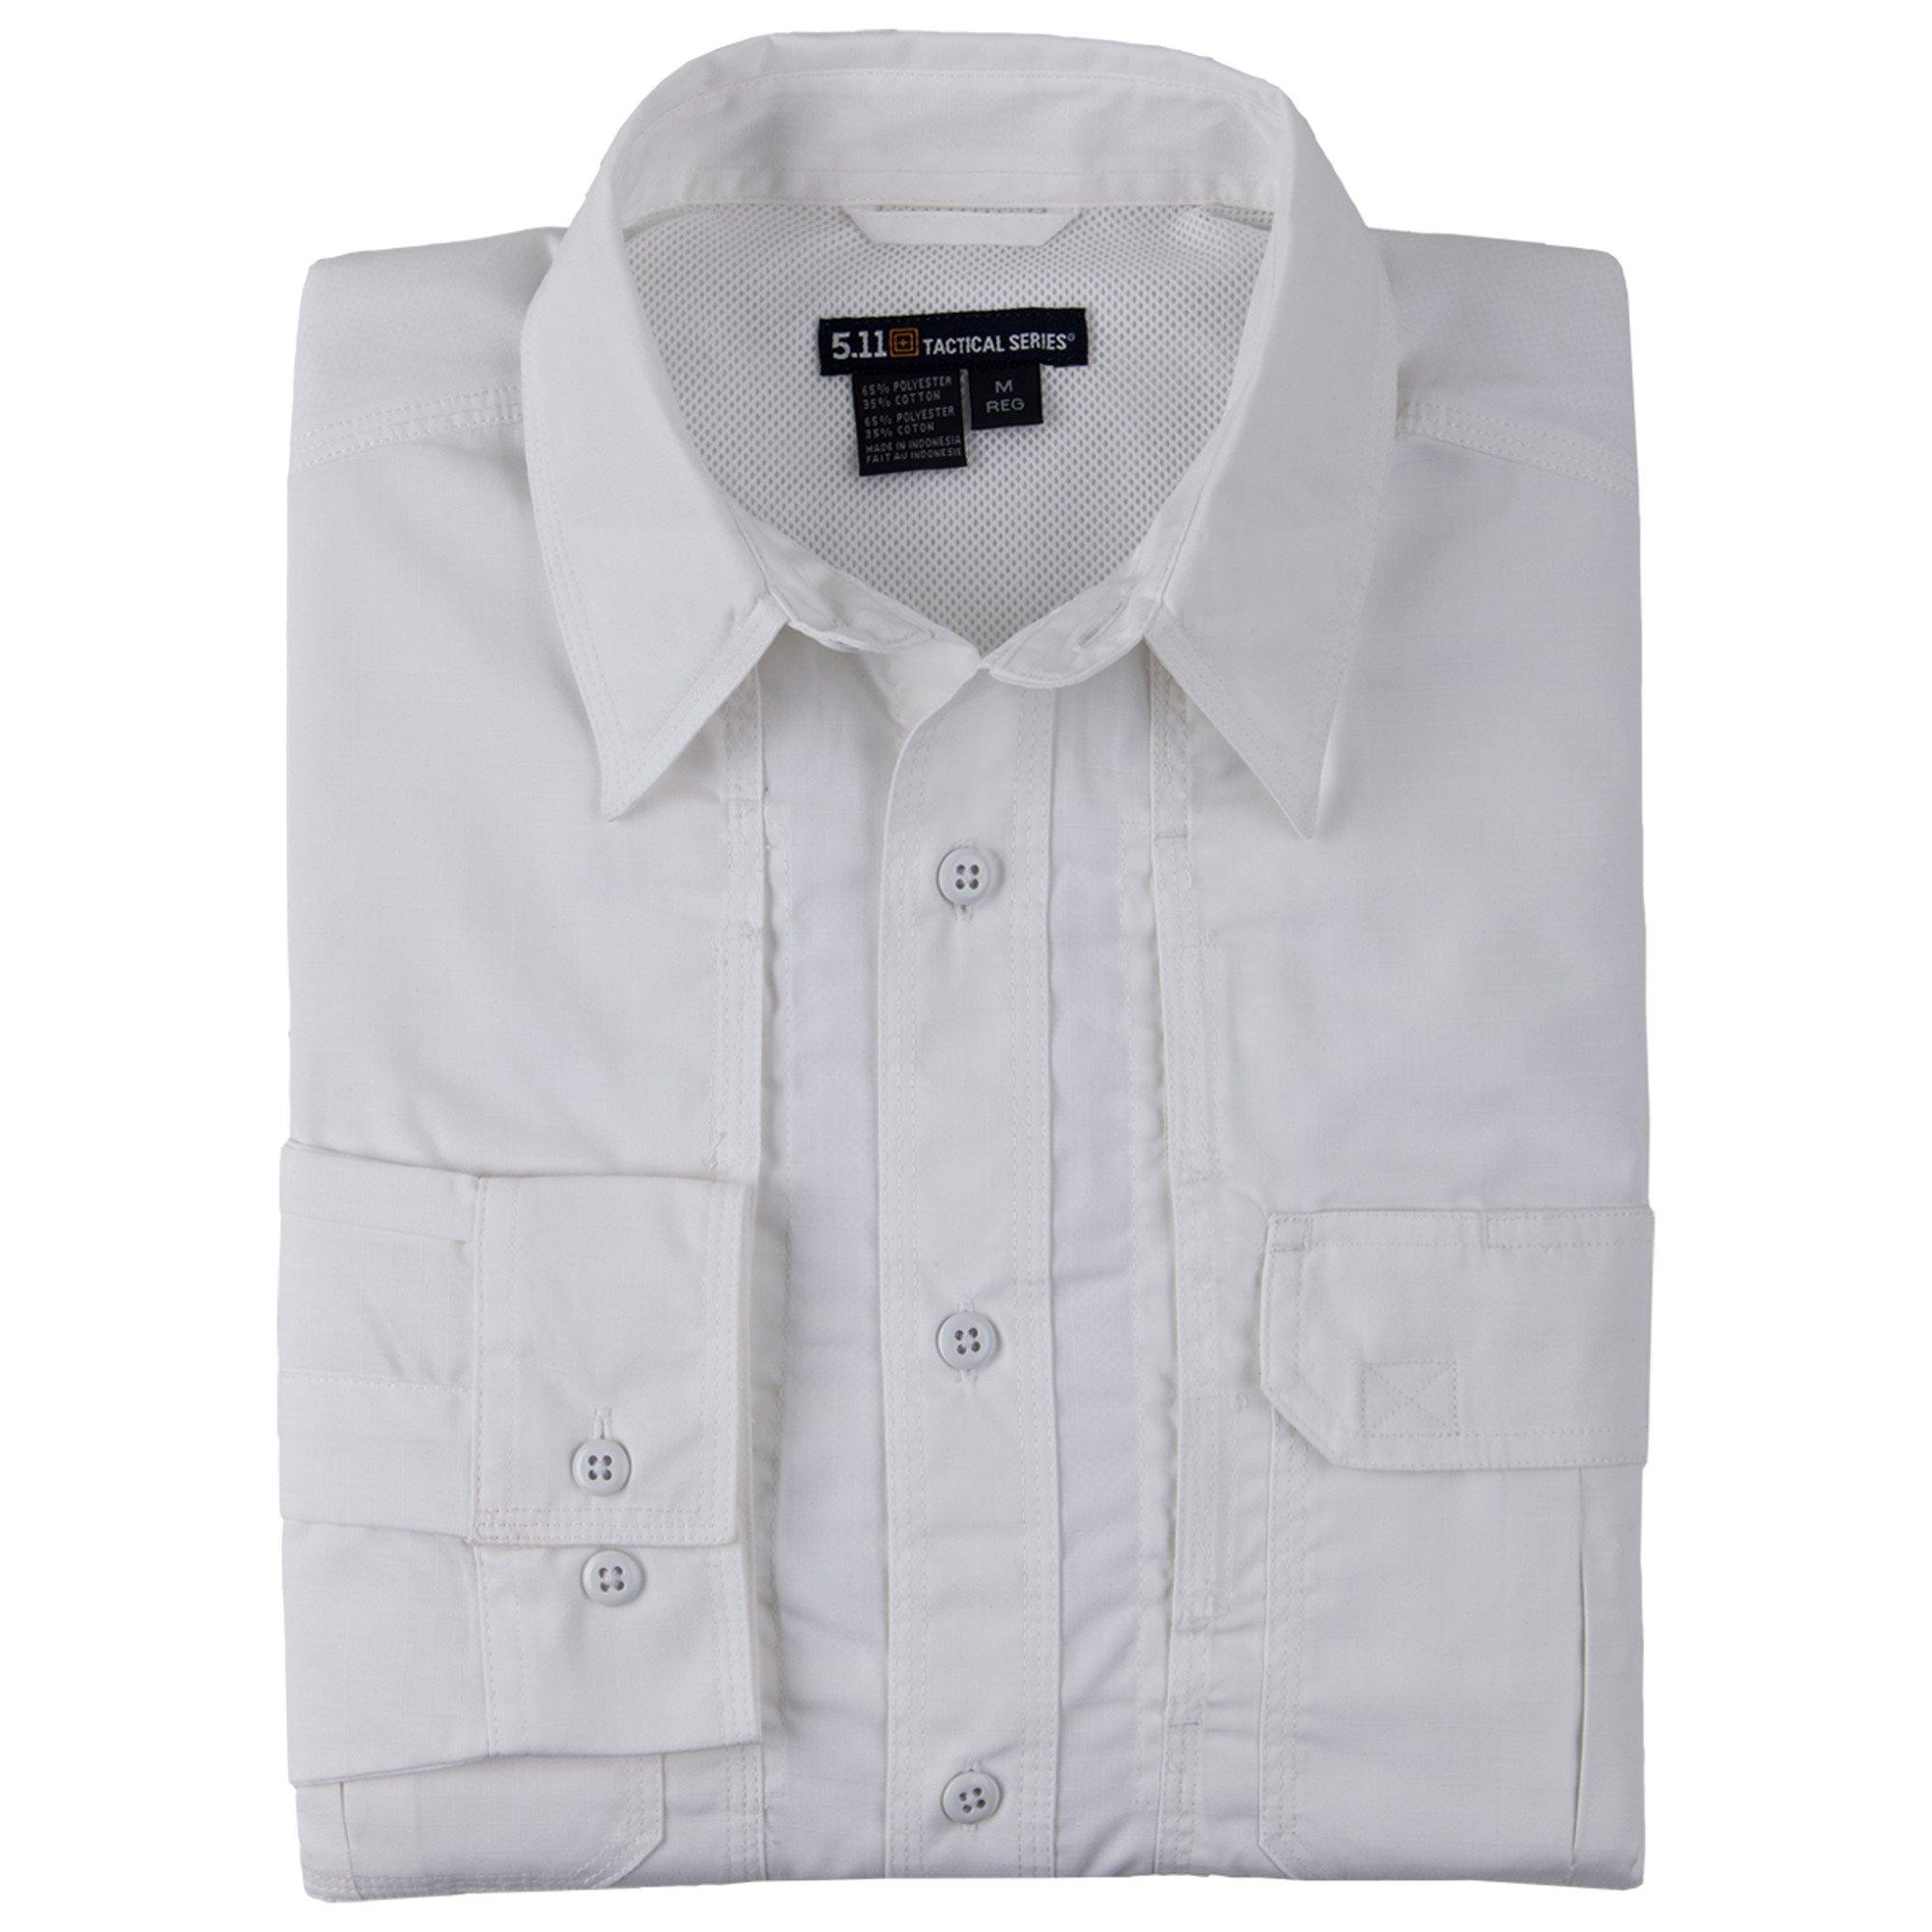 5.11 Tactical TacLite Professional Long Sleeve Shirt, White, Medium